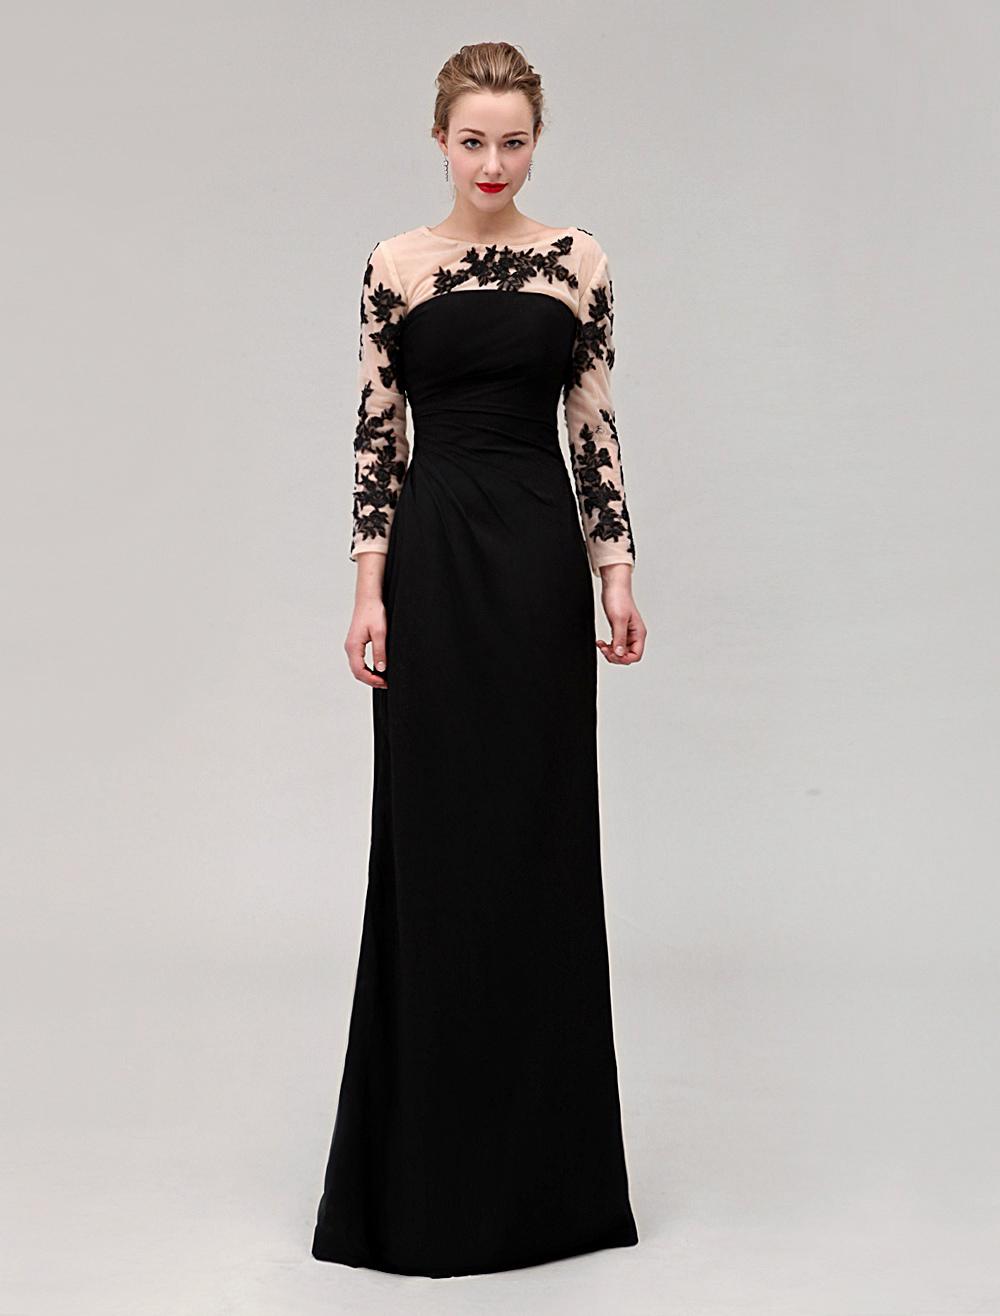 Black Wedding Dress Jewel Neck Pleated Floor-length Elastic Silk Dress